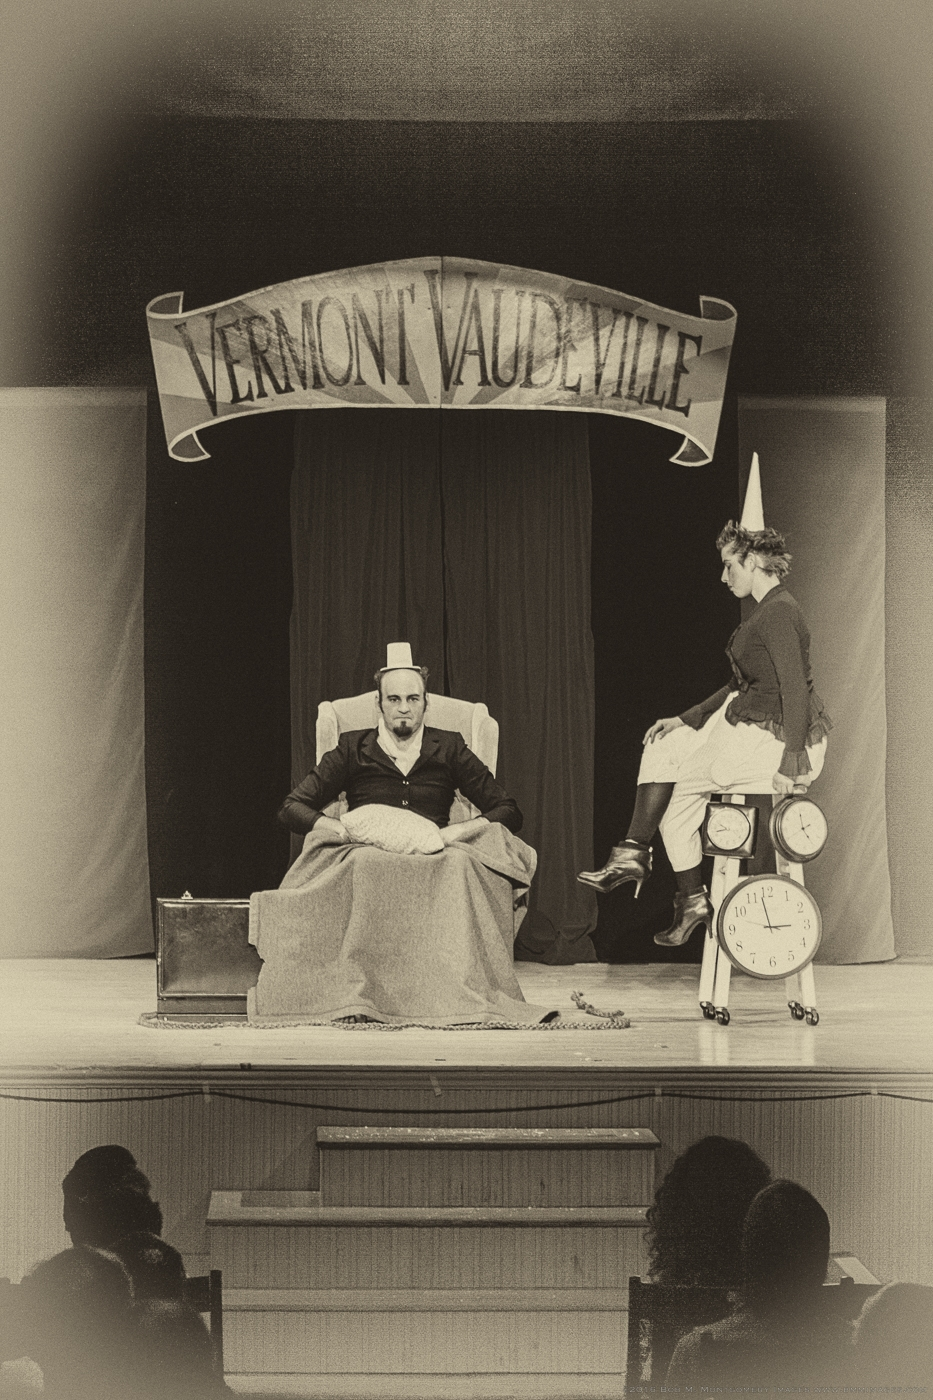 Vermont Vaudeville 20160513 - 0081.jpg